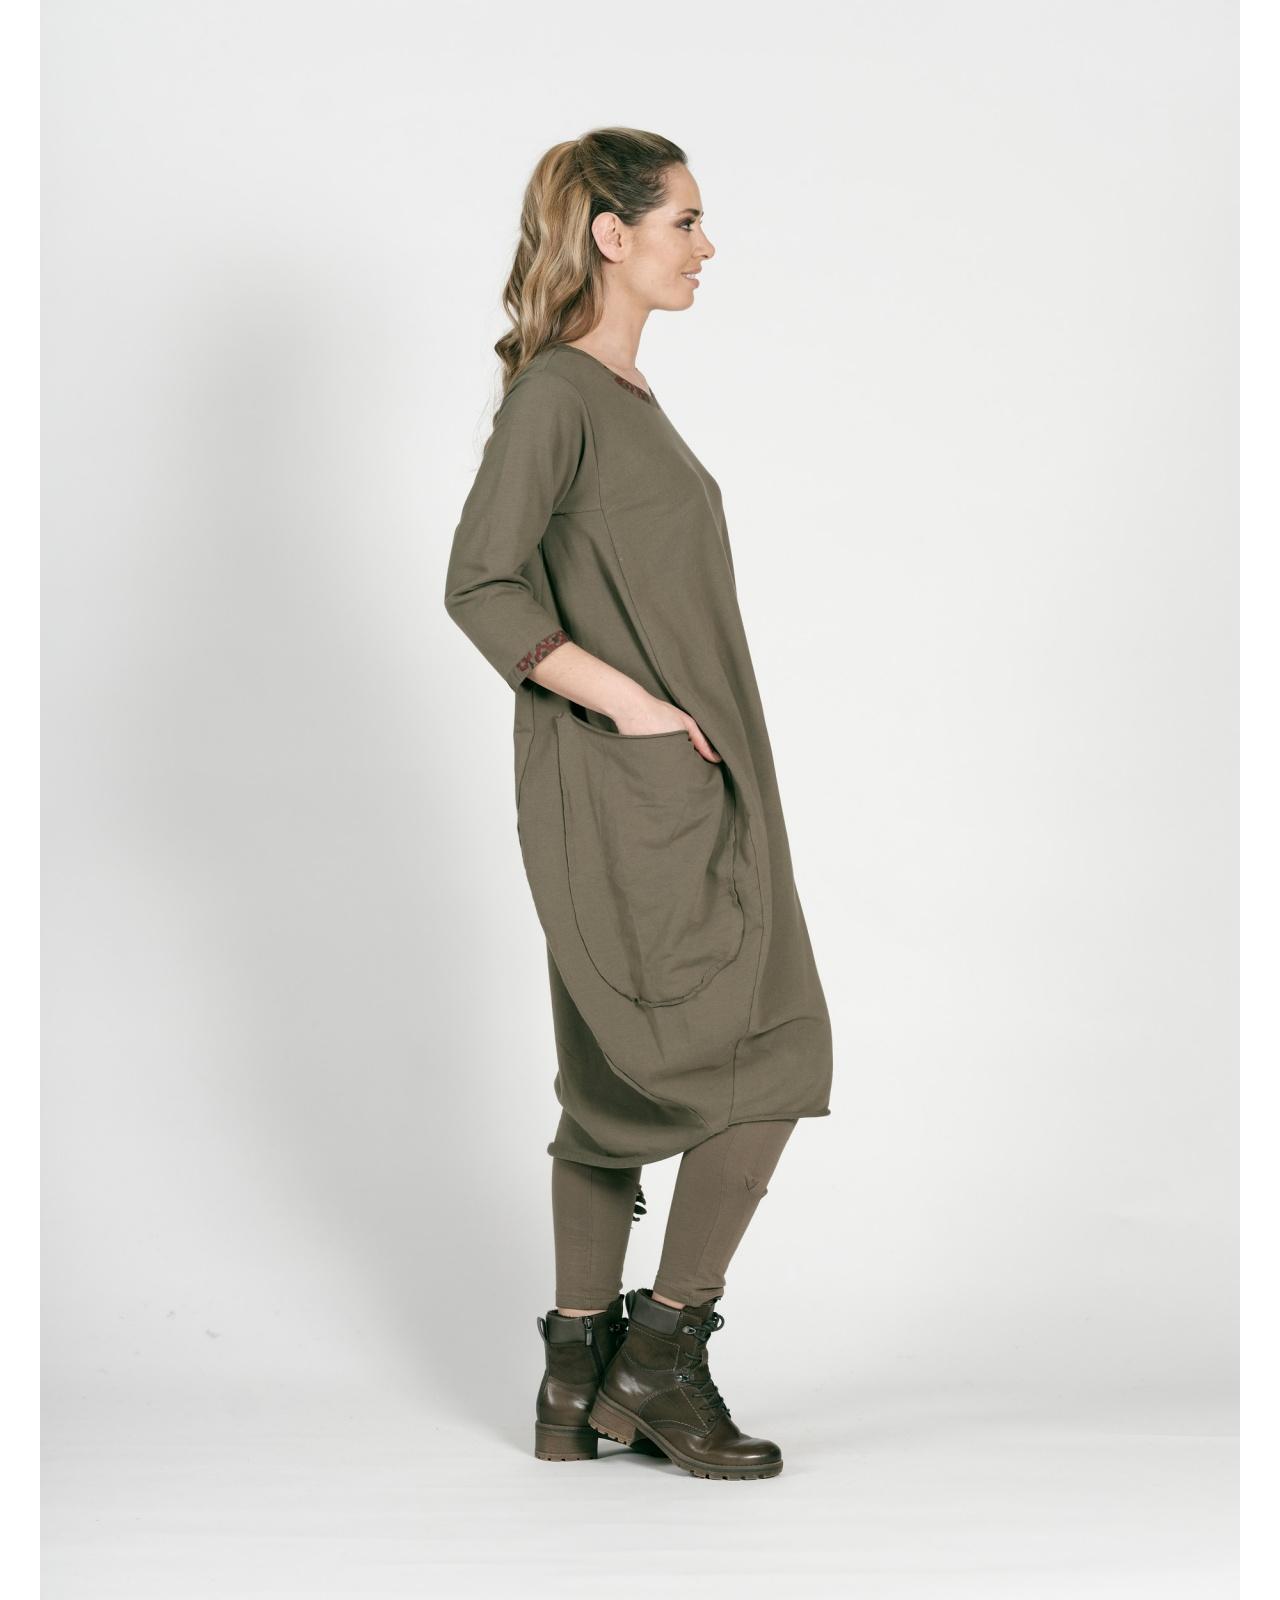 DRESS APPOLINE N°84